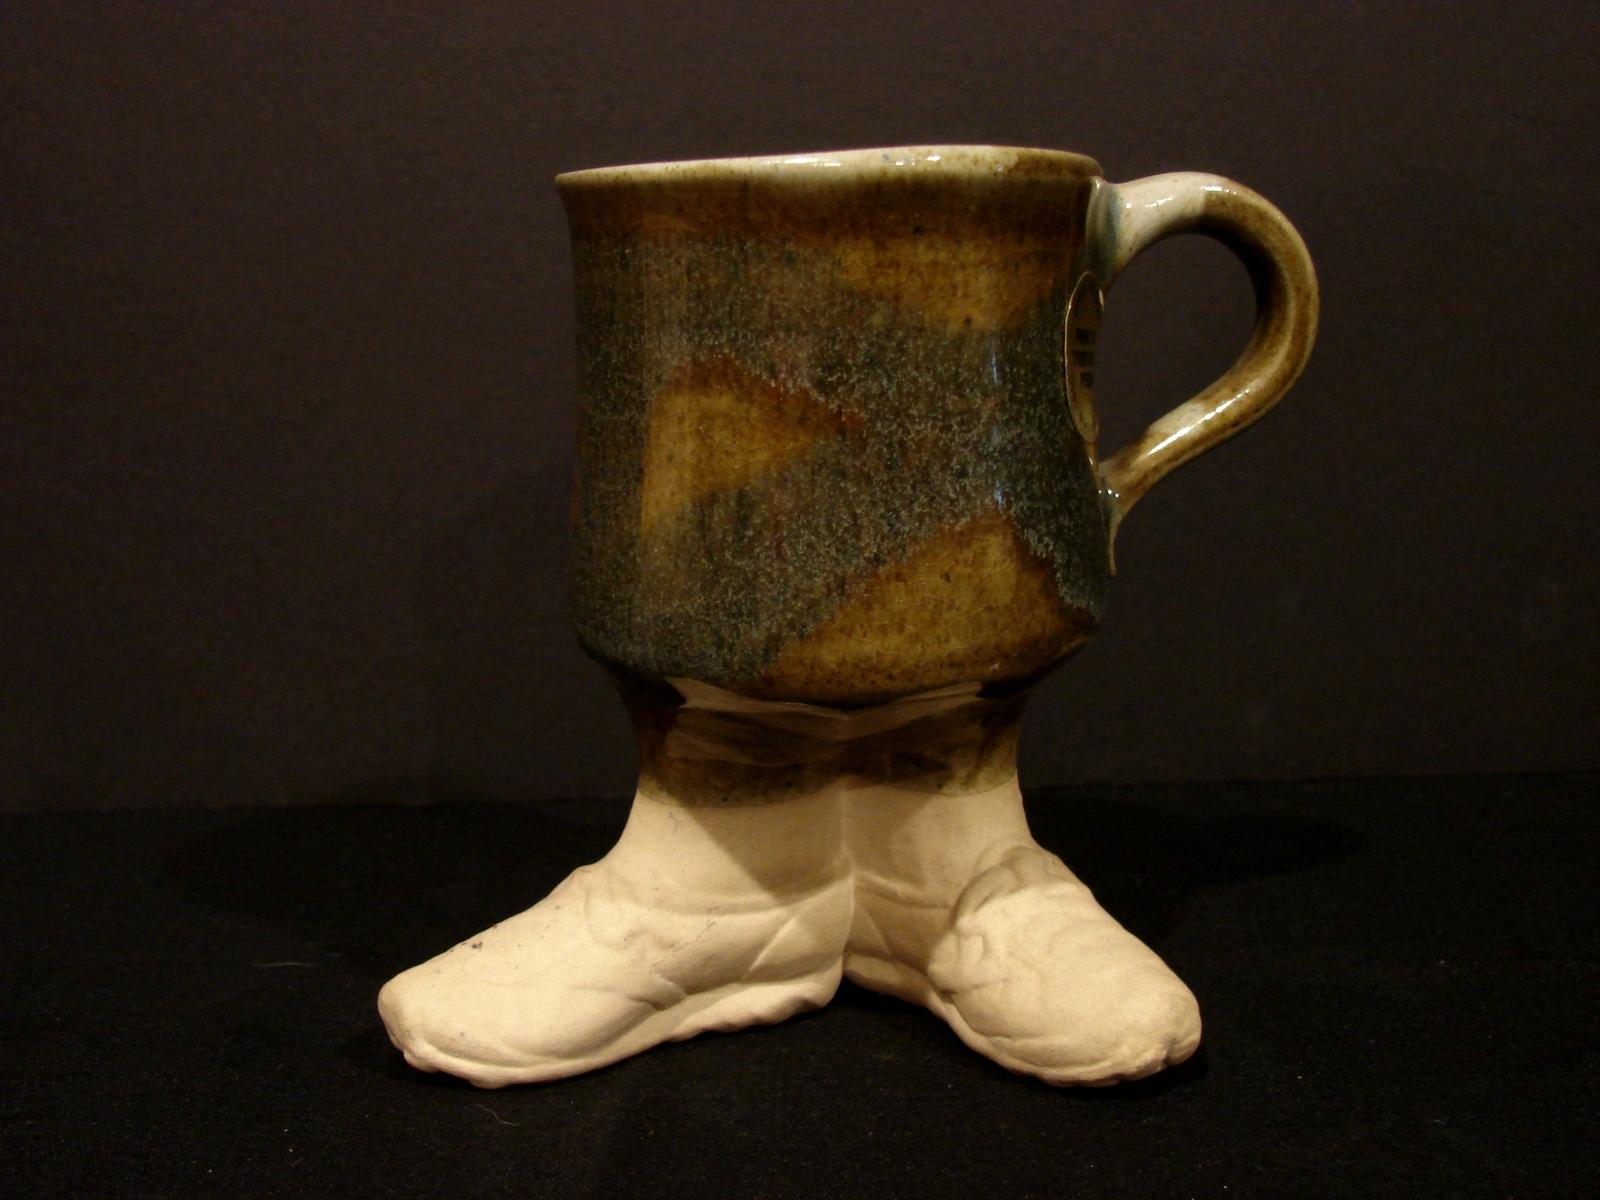 1980 Foot Sneakers Pottery Coffee Mug Signed Five Bridges Inc - $9.90